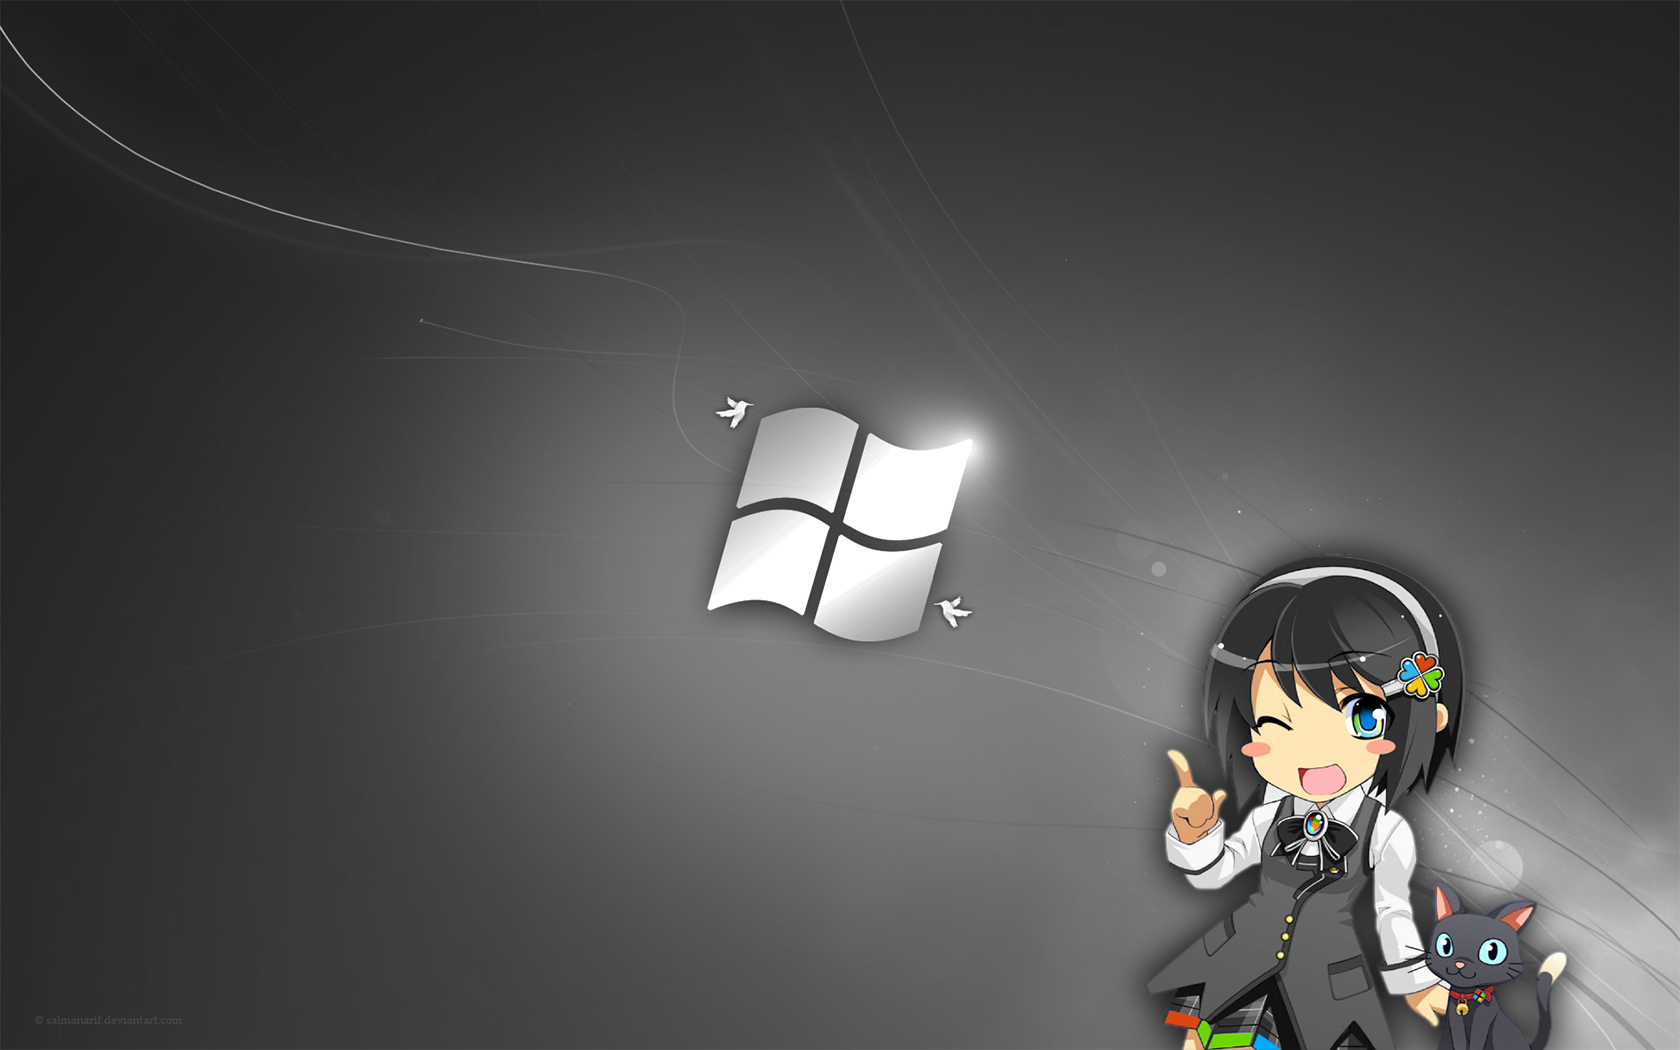 Anime Windows Girl Wallpaper 1680x1050 Anime Windows Girl 1680x1050